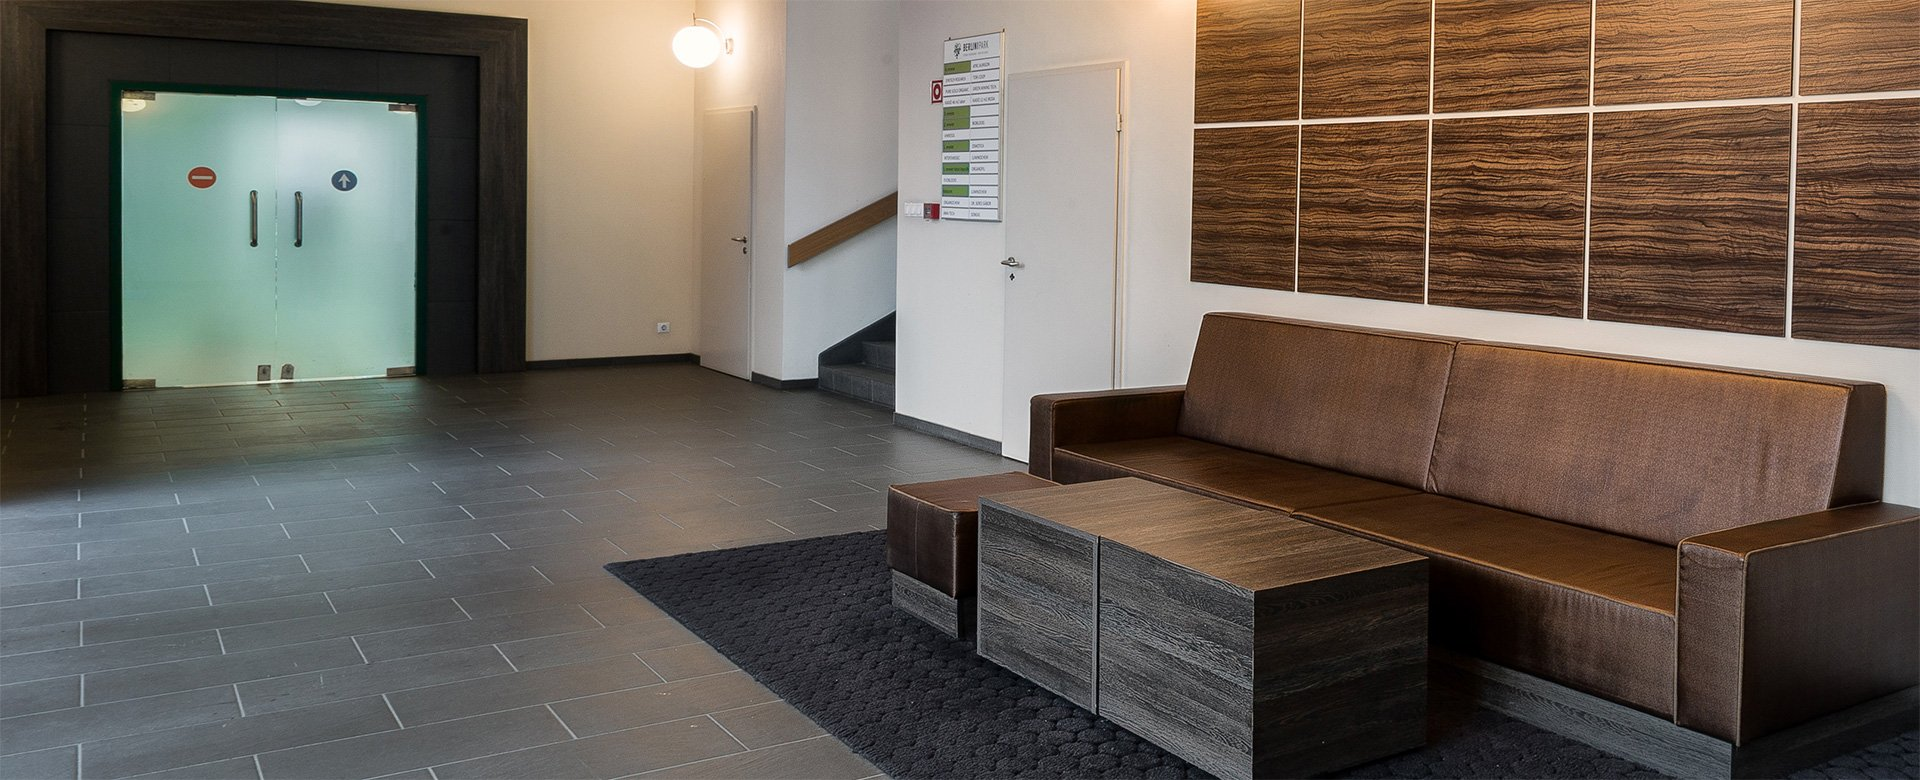 Berlini Park 3-as épület lobby helyiség